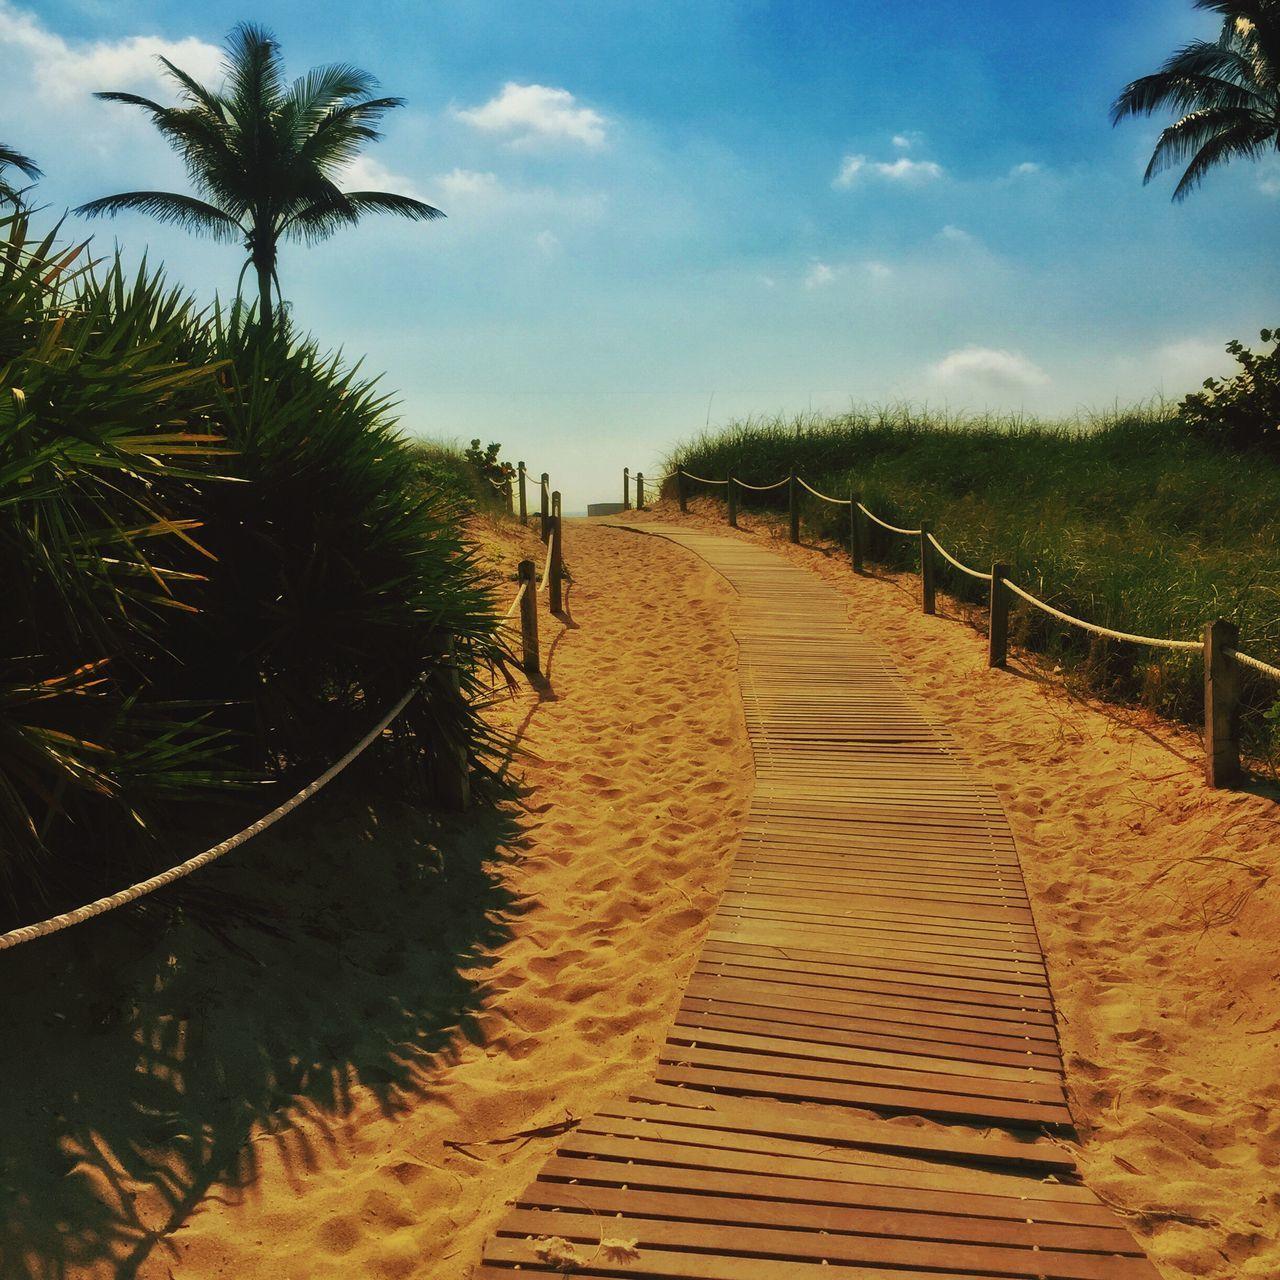 I'm back Miami. ❤️ Miami Miamibeach Miami Beach Beach Photography Beach Sand Sand Walk Beachtime Palms Nature Relaxing